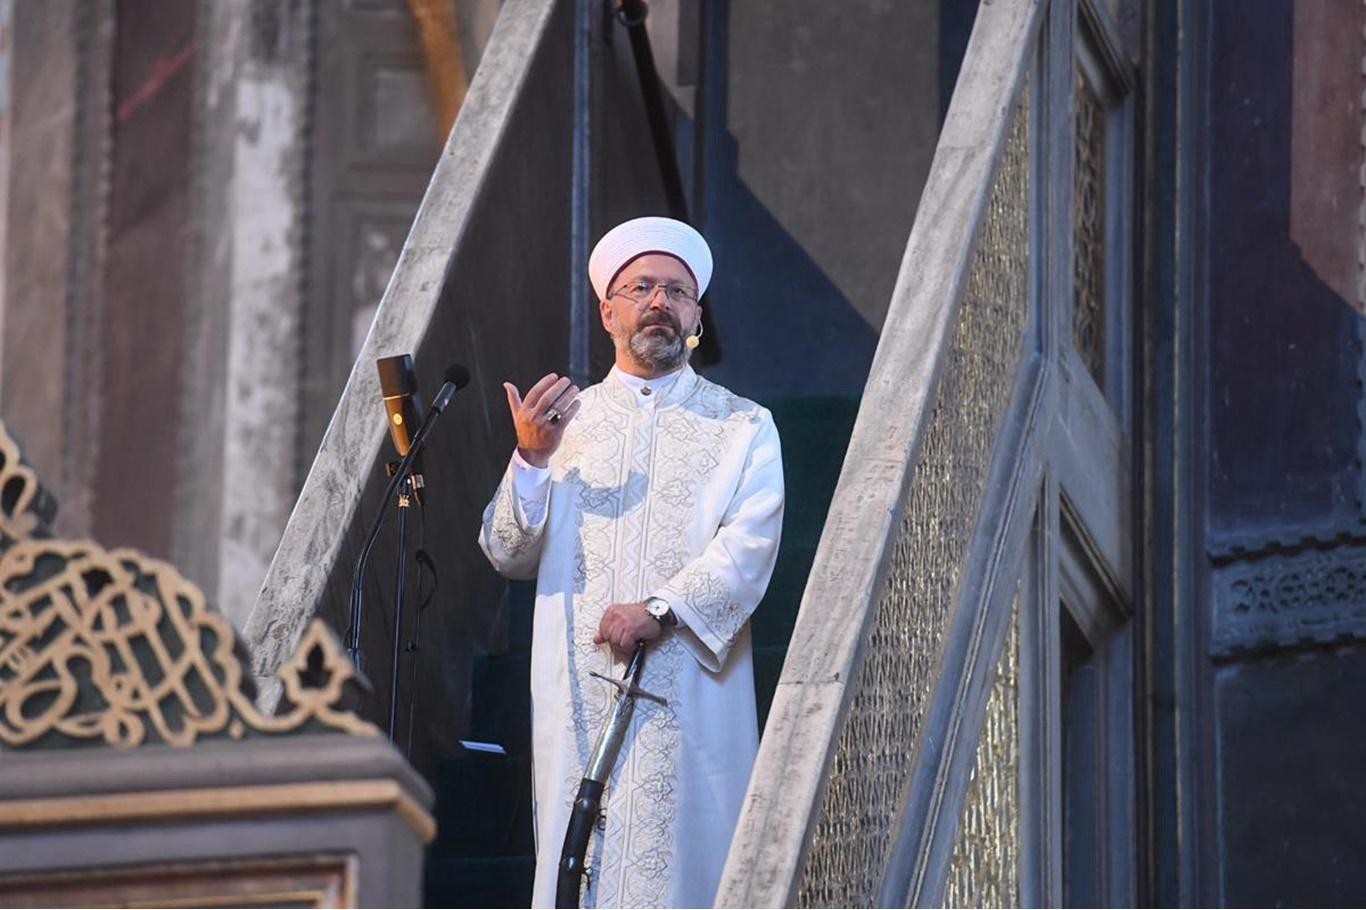 Hagia Sophia Imam Holding Sword شاعرية السيف - آيا صوفيا